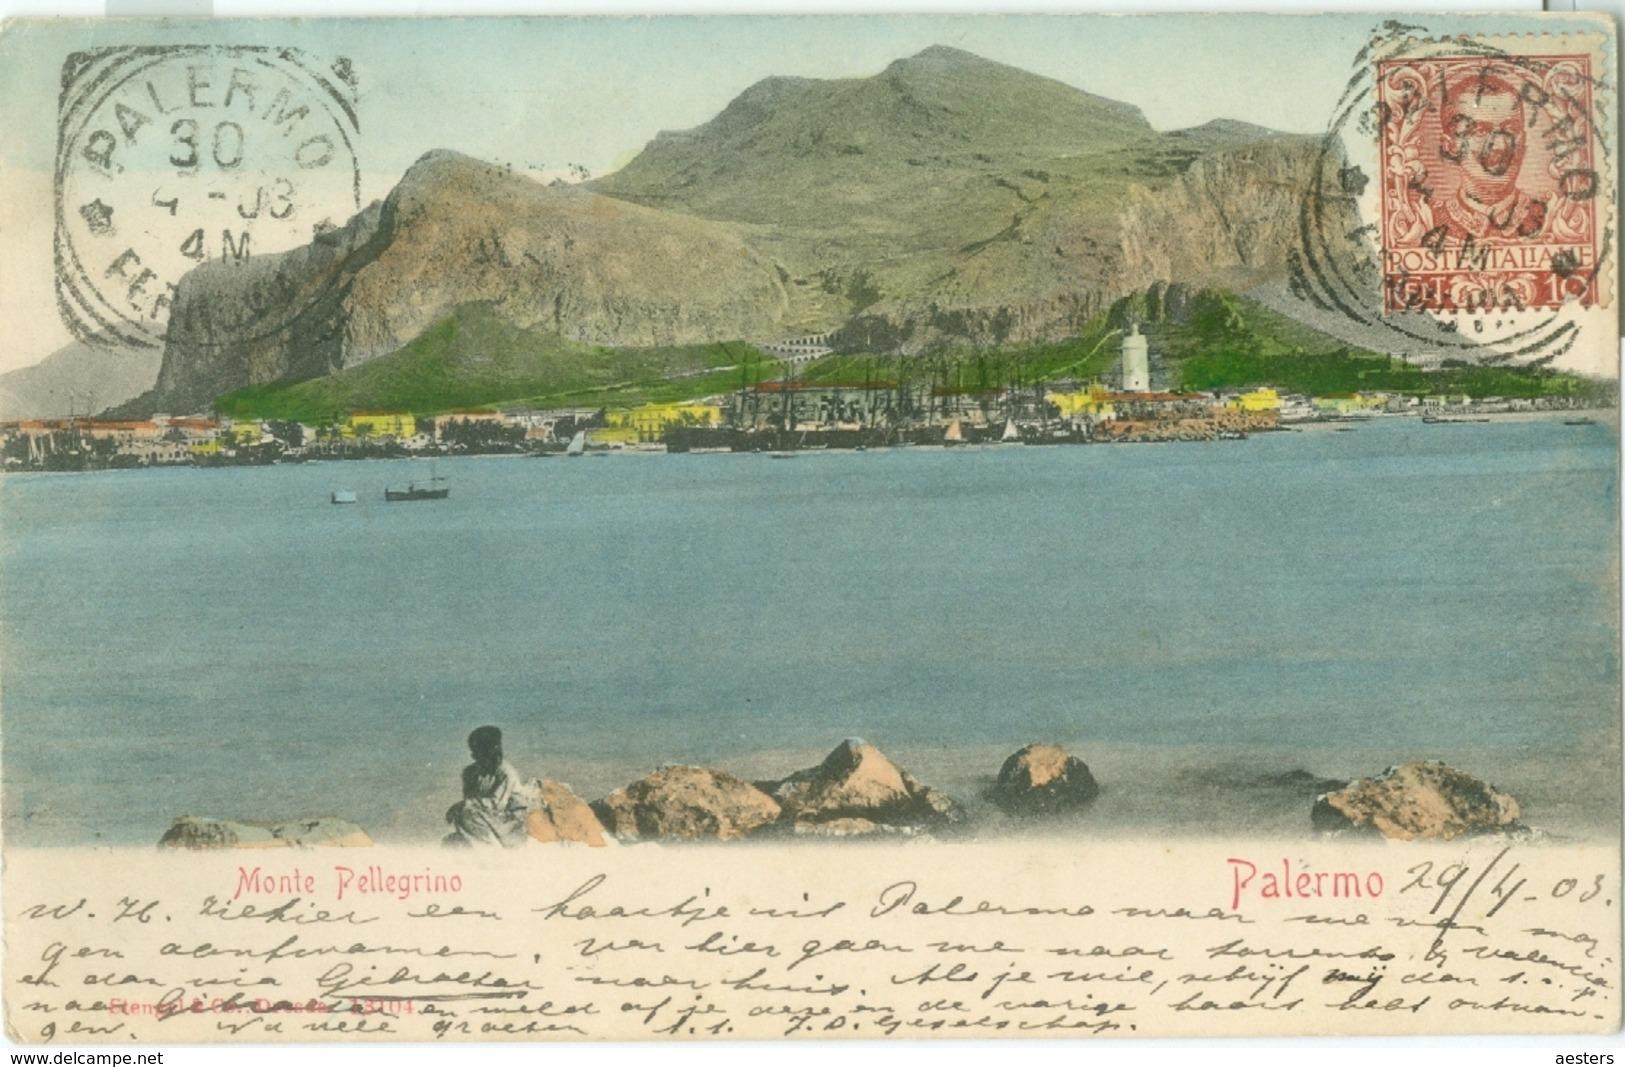 Palermo 1903; Monte Pellegrino - Viaggiata. (Stengel & Co. - Dresden) - Palermo